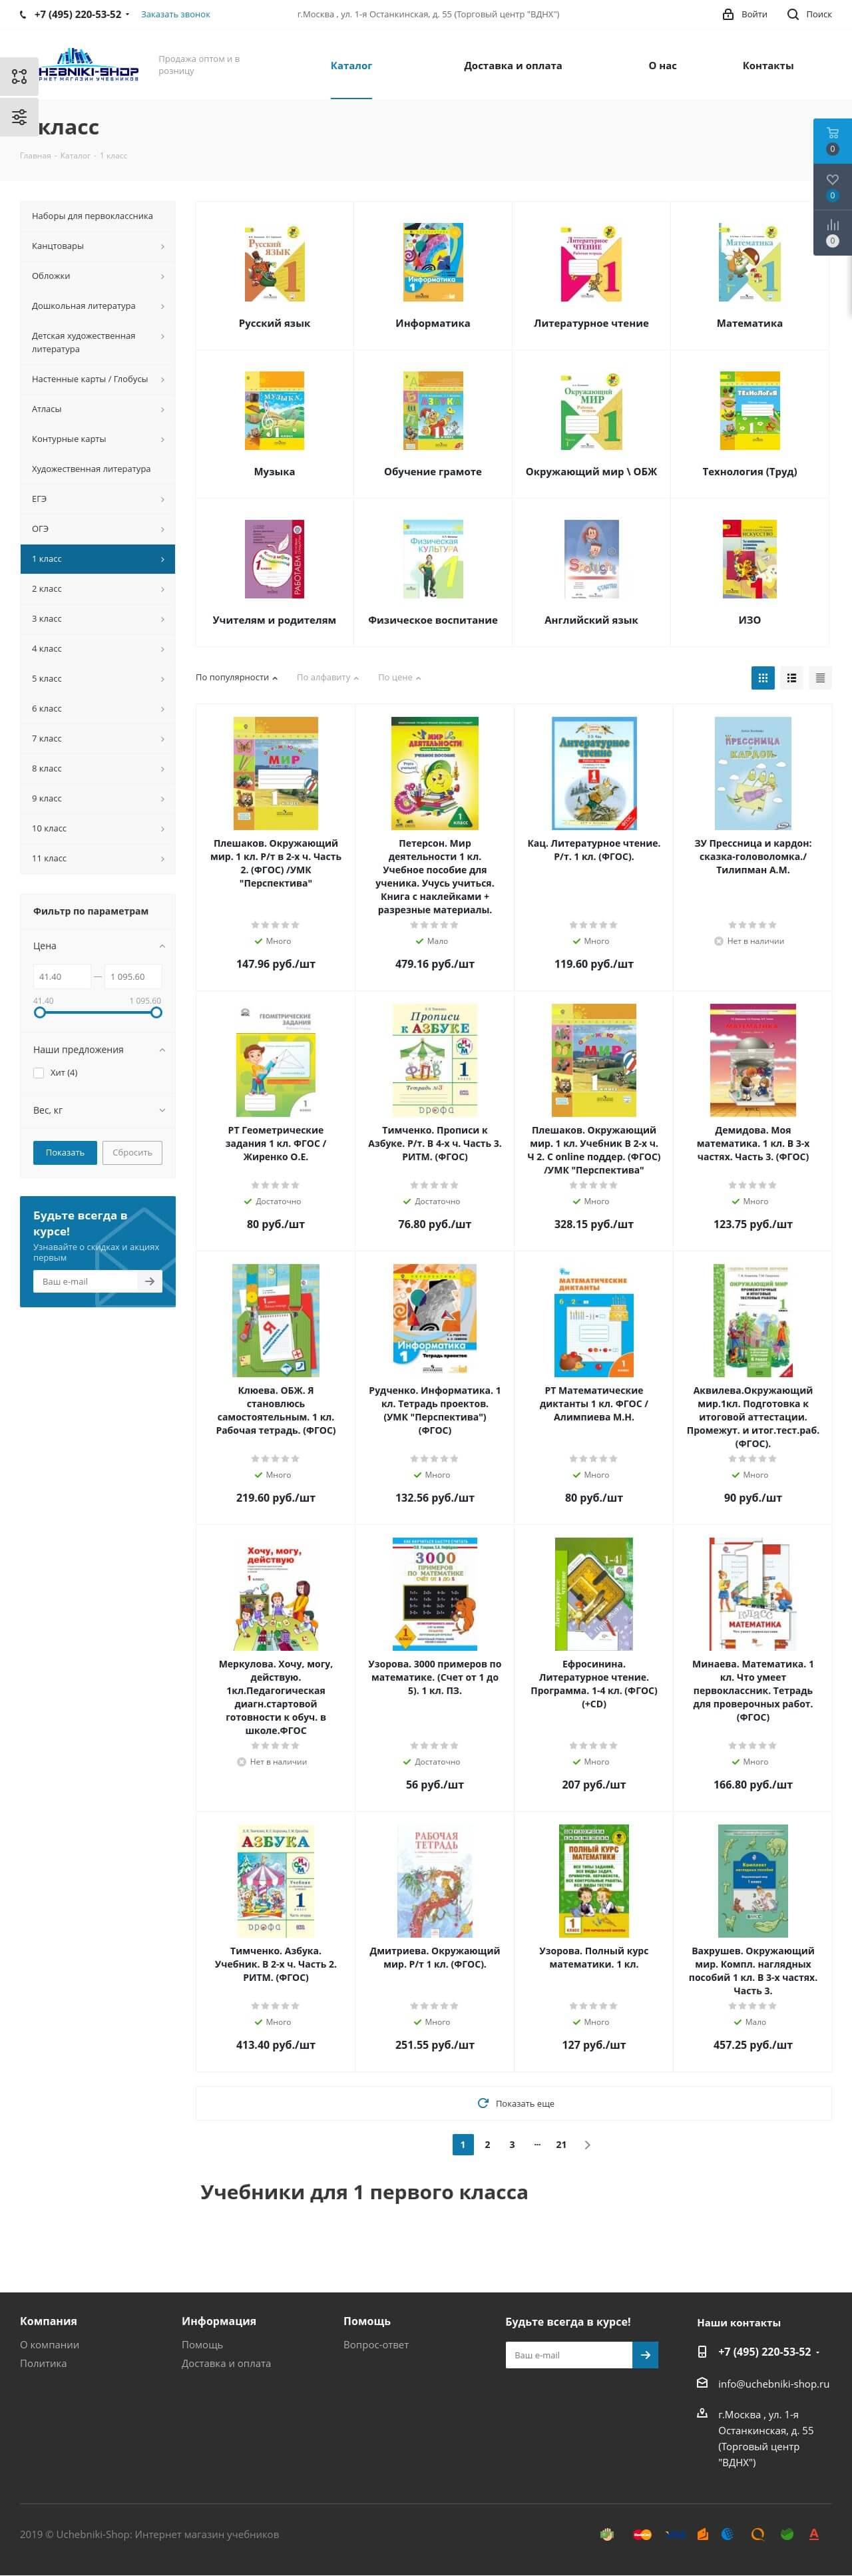 Портфолио - каталог интернет магазина